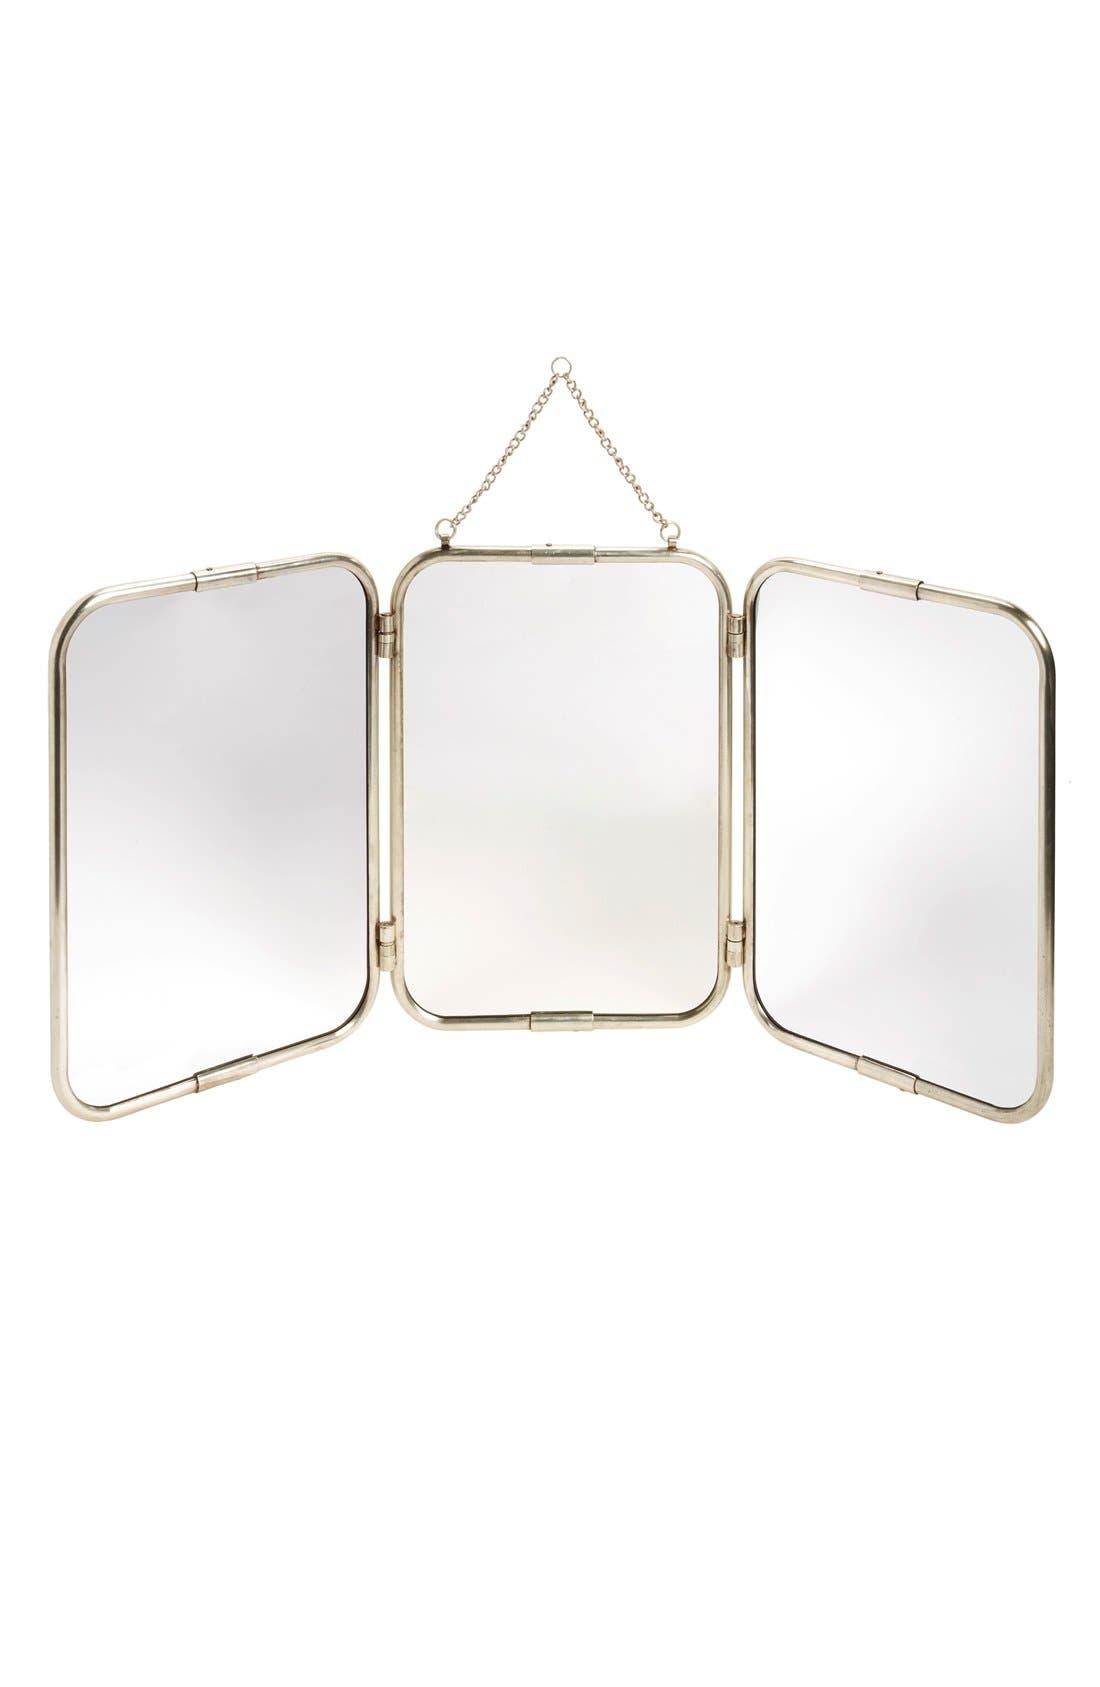 Alternate Image 1 Selected - Creative Co-Op 3-Panel Mirror